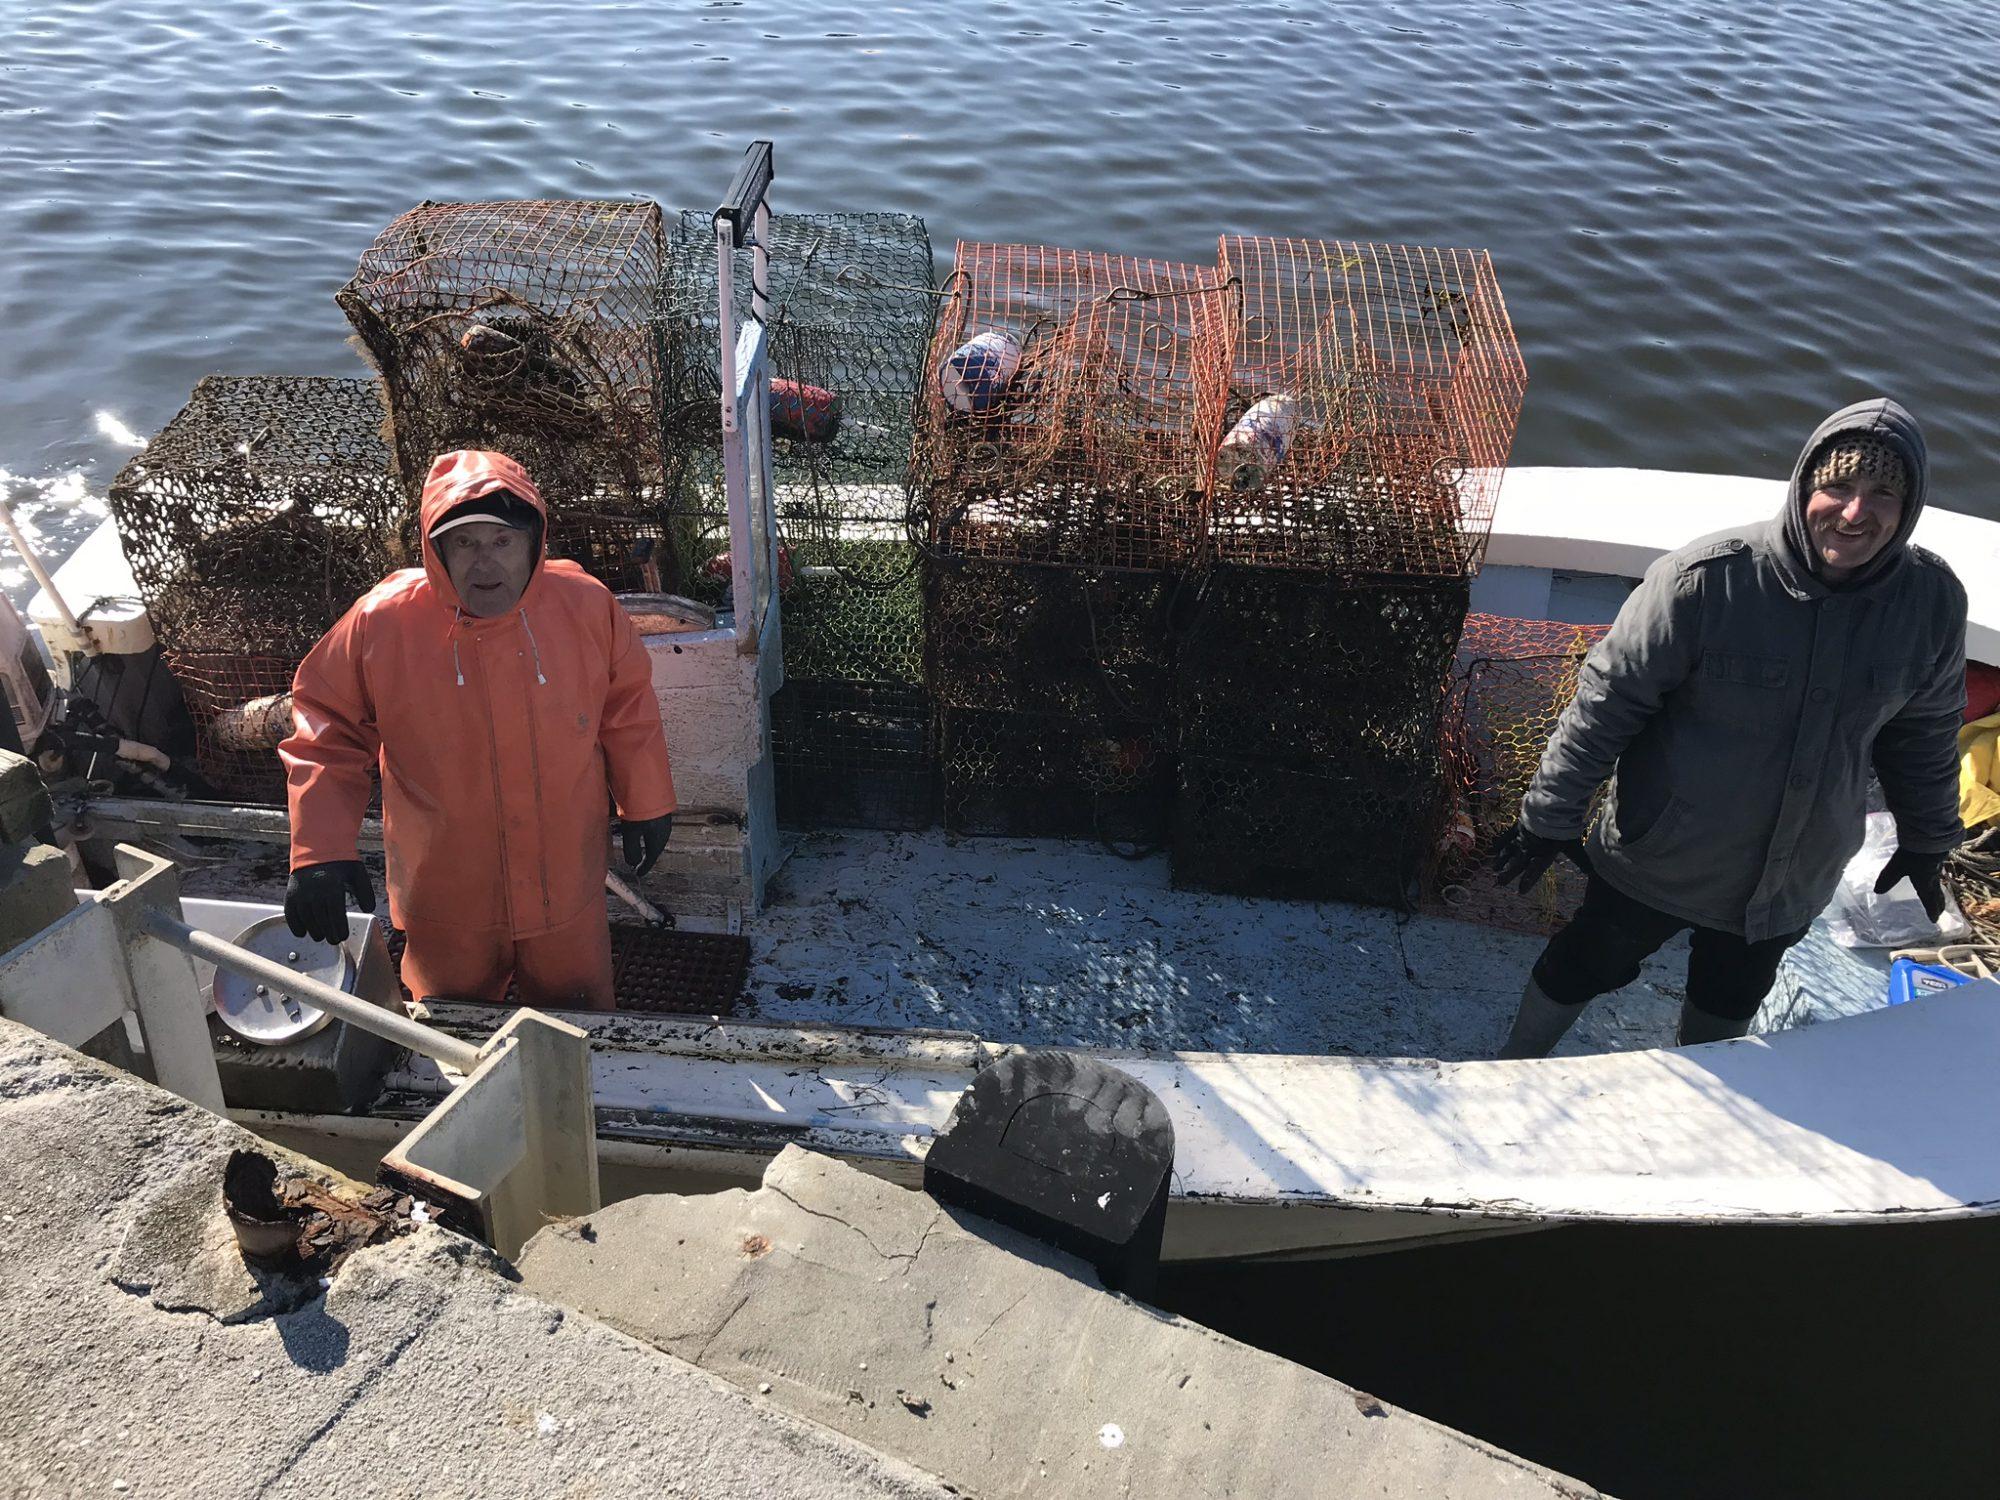 Fishermen collecting crab pots